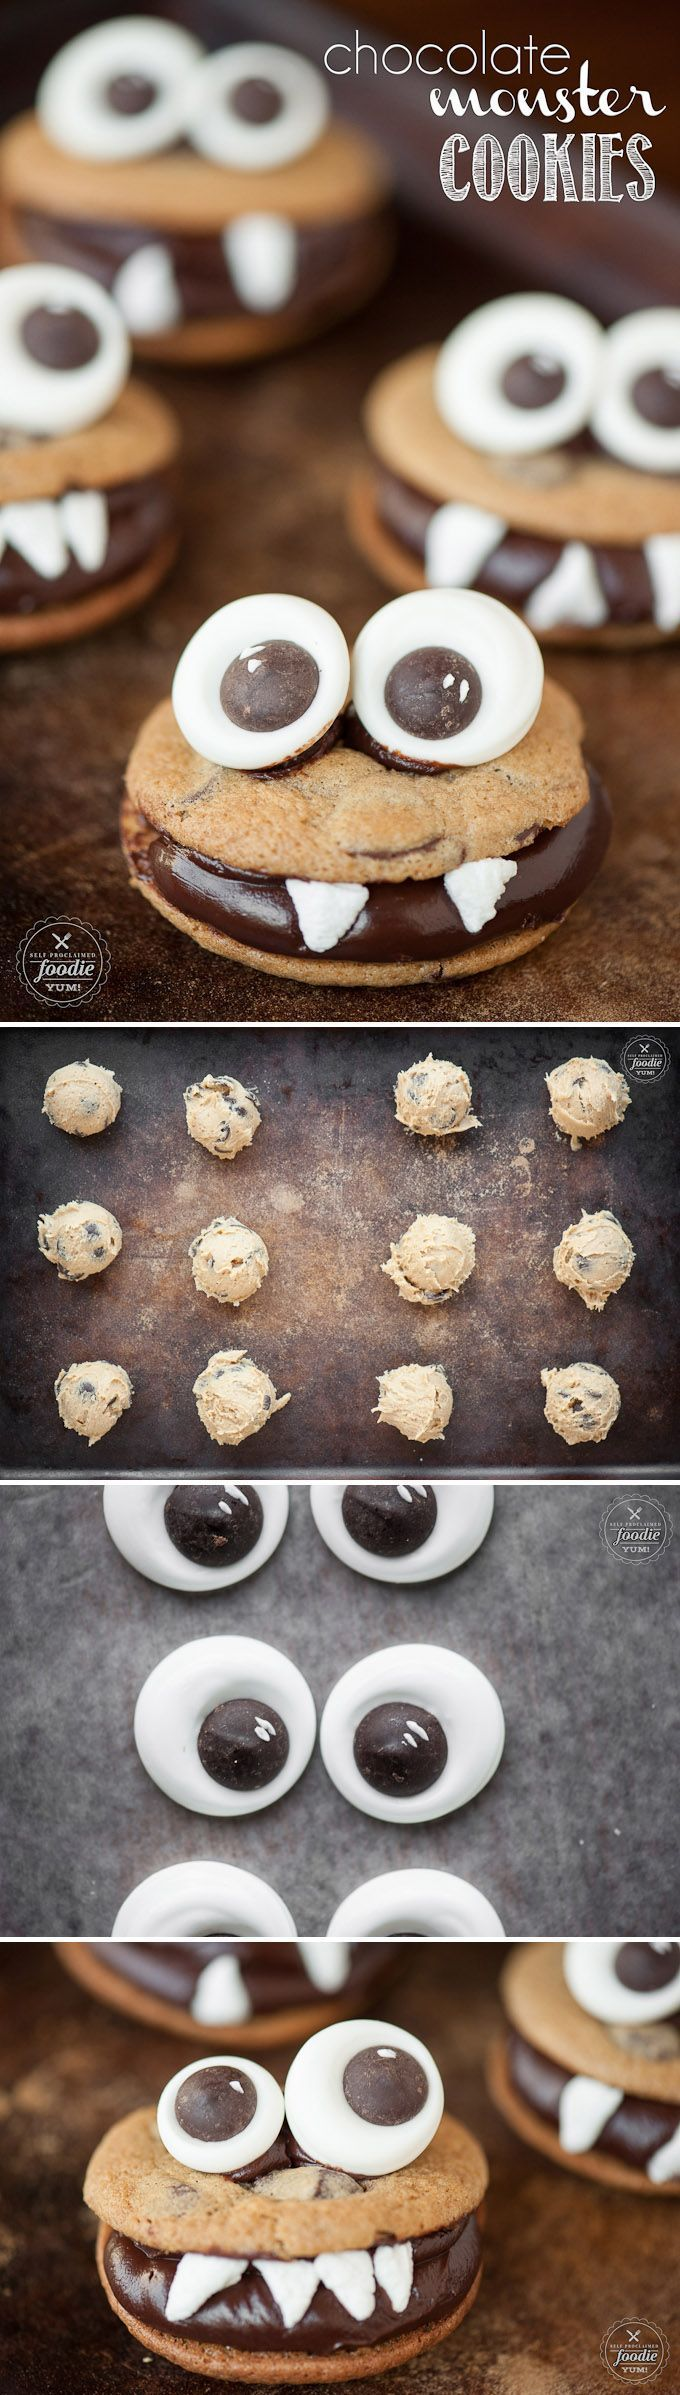 Best 25+ Halloween kekse ideas only on Pinterest | Nachspeisen ...